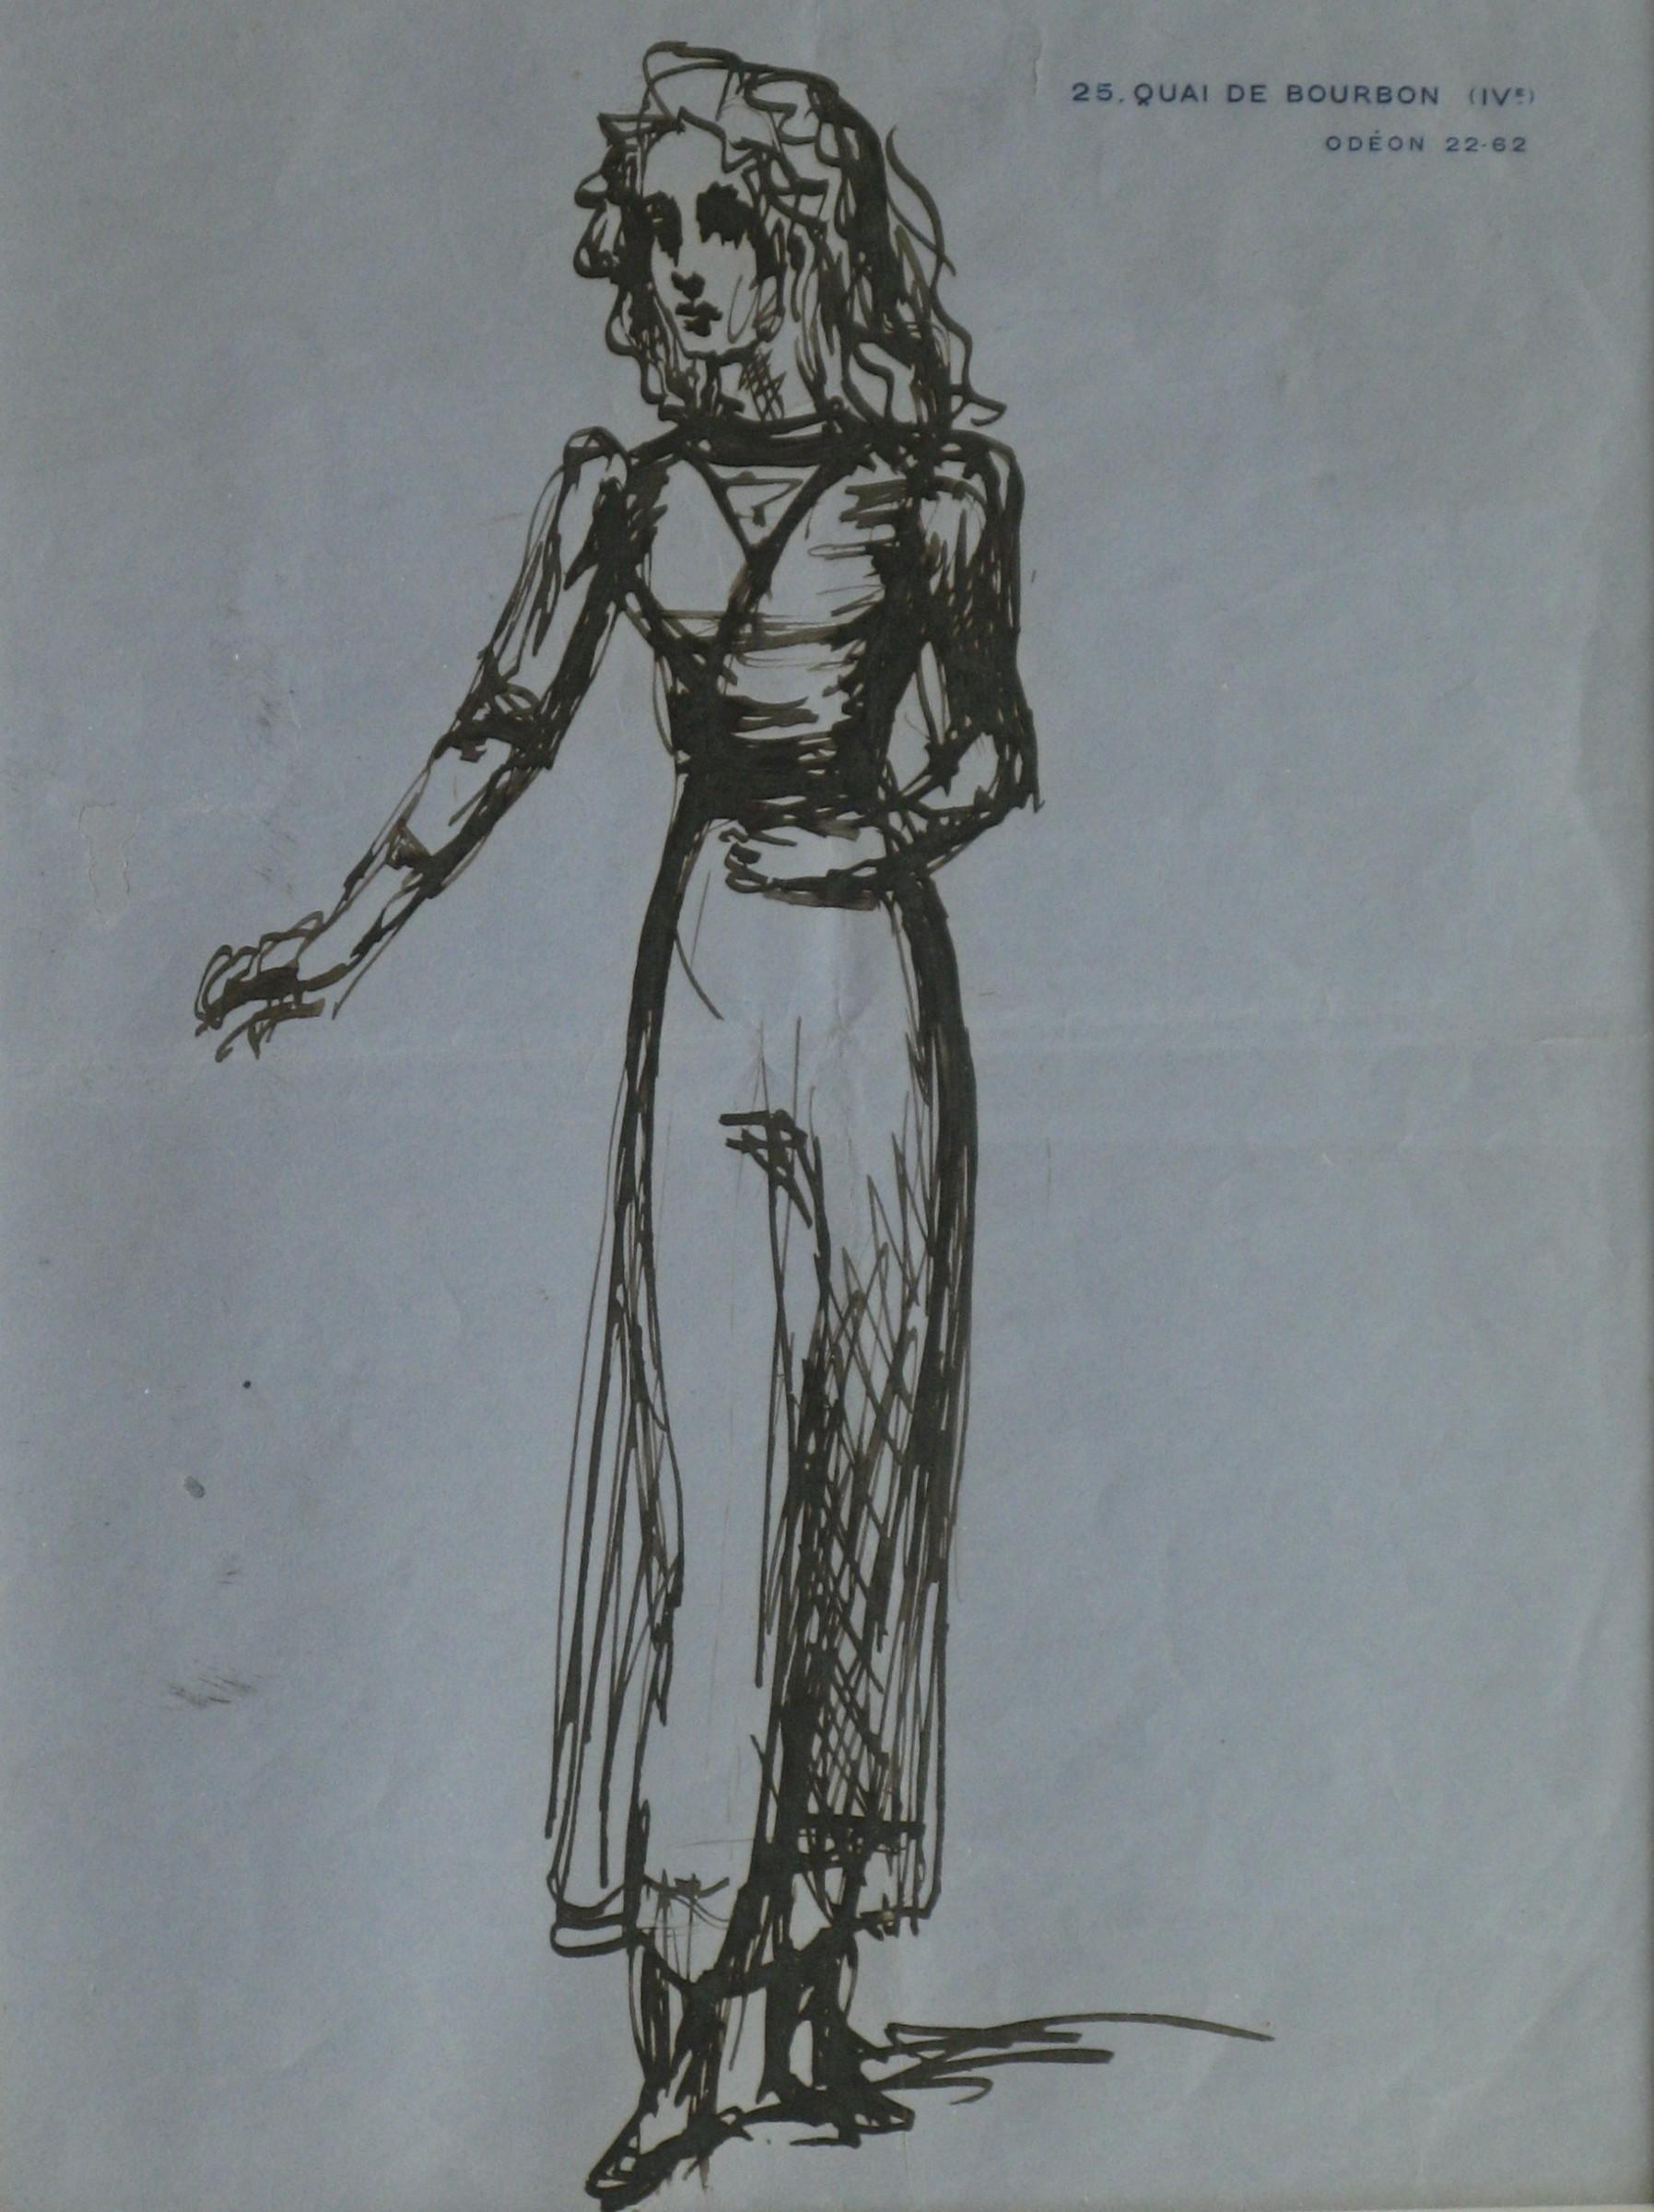 Study of Iya Abdy, by Balthus. Image via Artlogic.